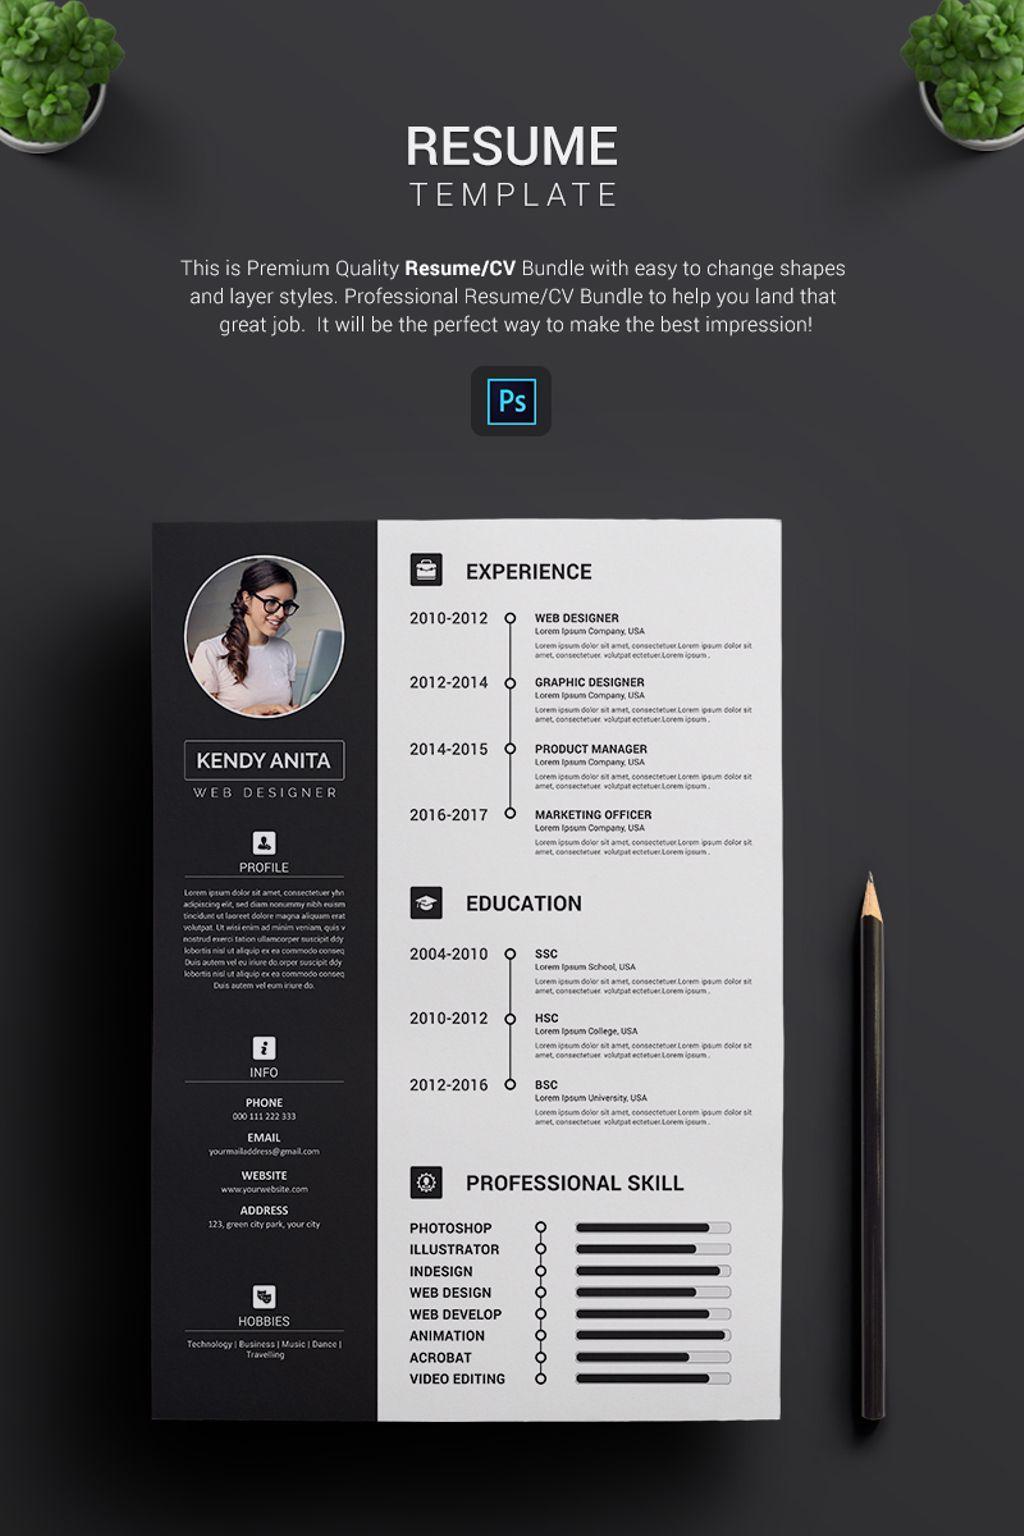 Andy Cv Resume Template 70646 Resume Template Resume Cv Resume Template